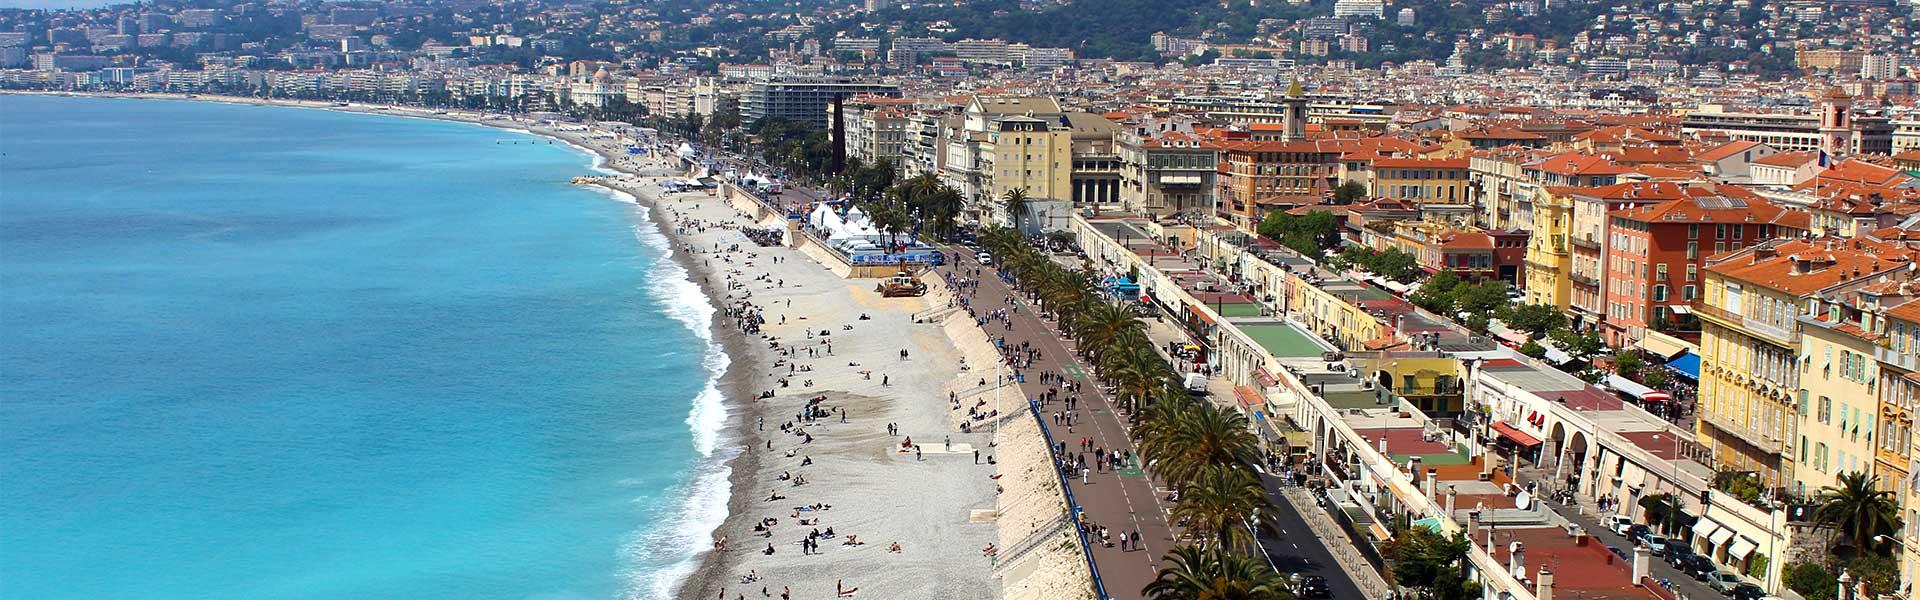 Nizza Urlaub in Frankreich